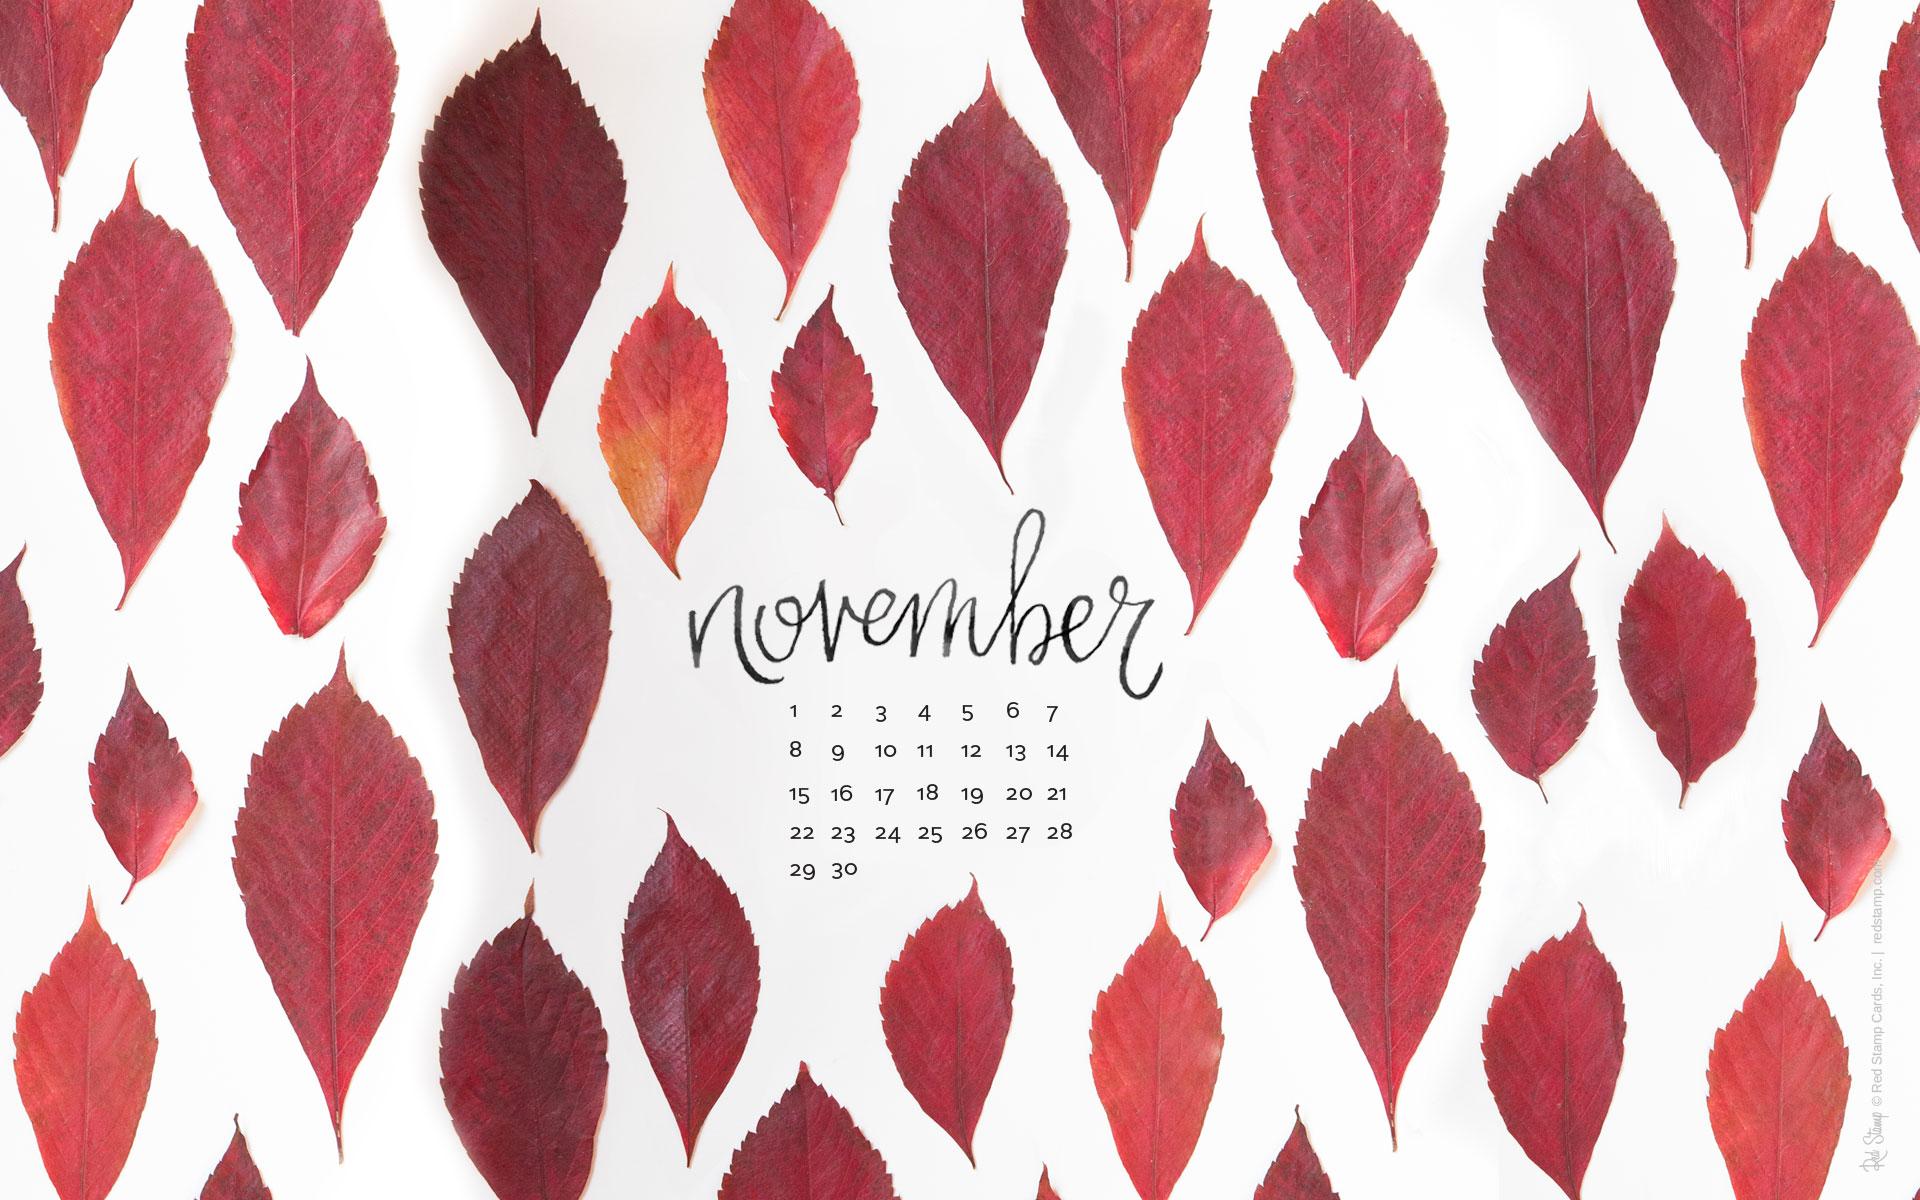 November 2015 Free Calendars and Wallpaper